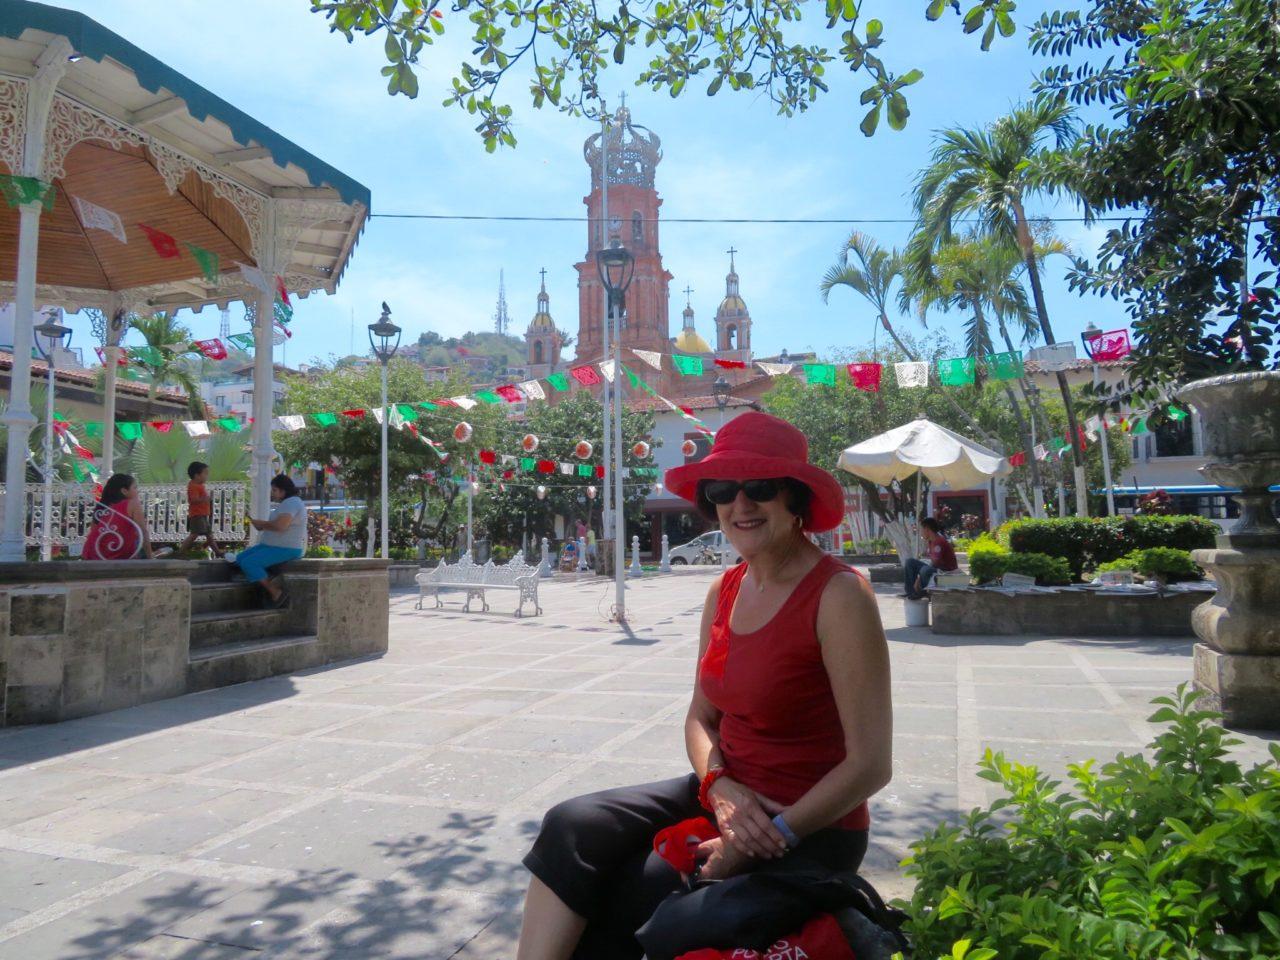 Puerto Vallarta : Relaxing in the zocalo